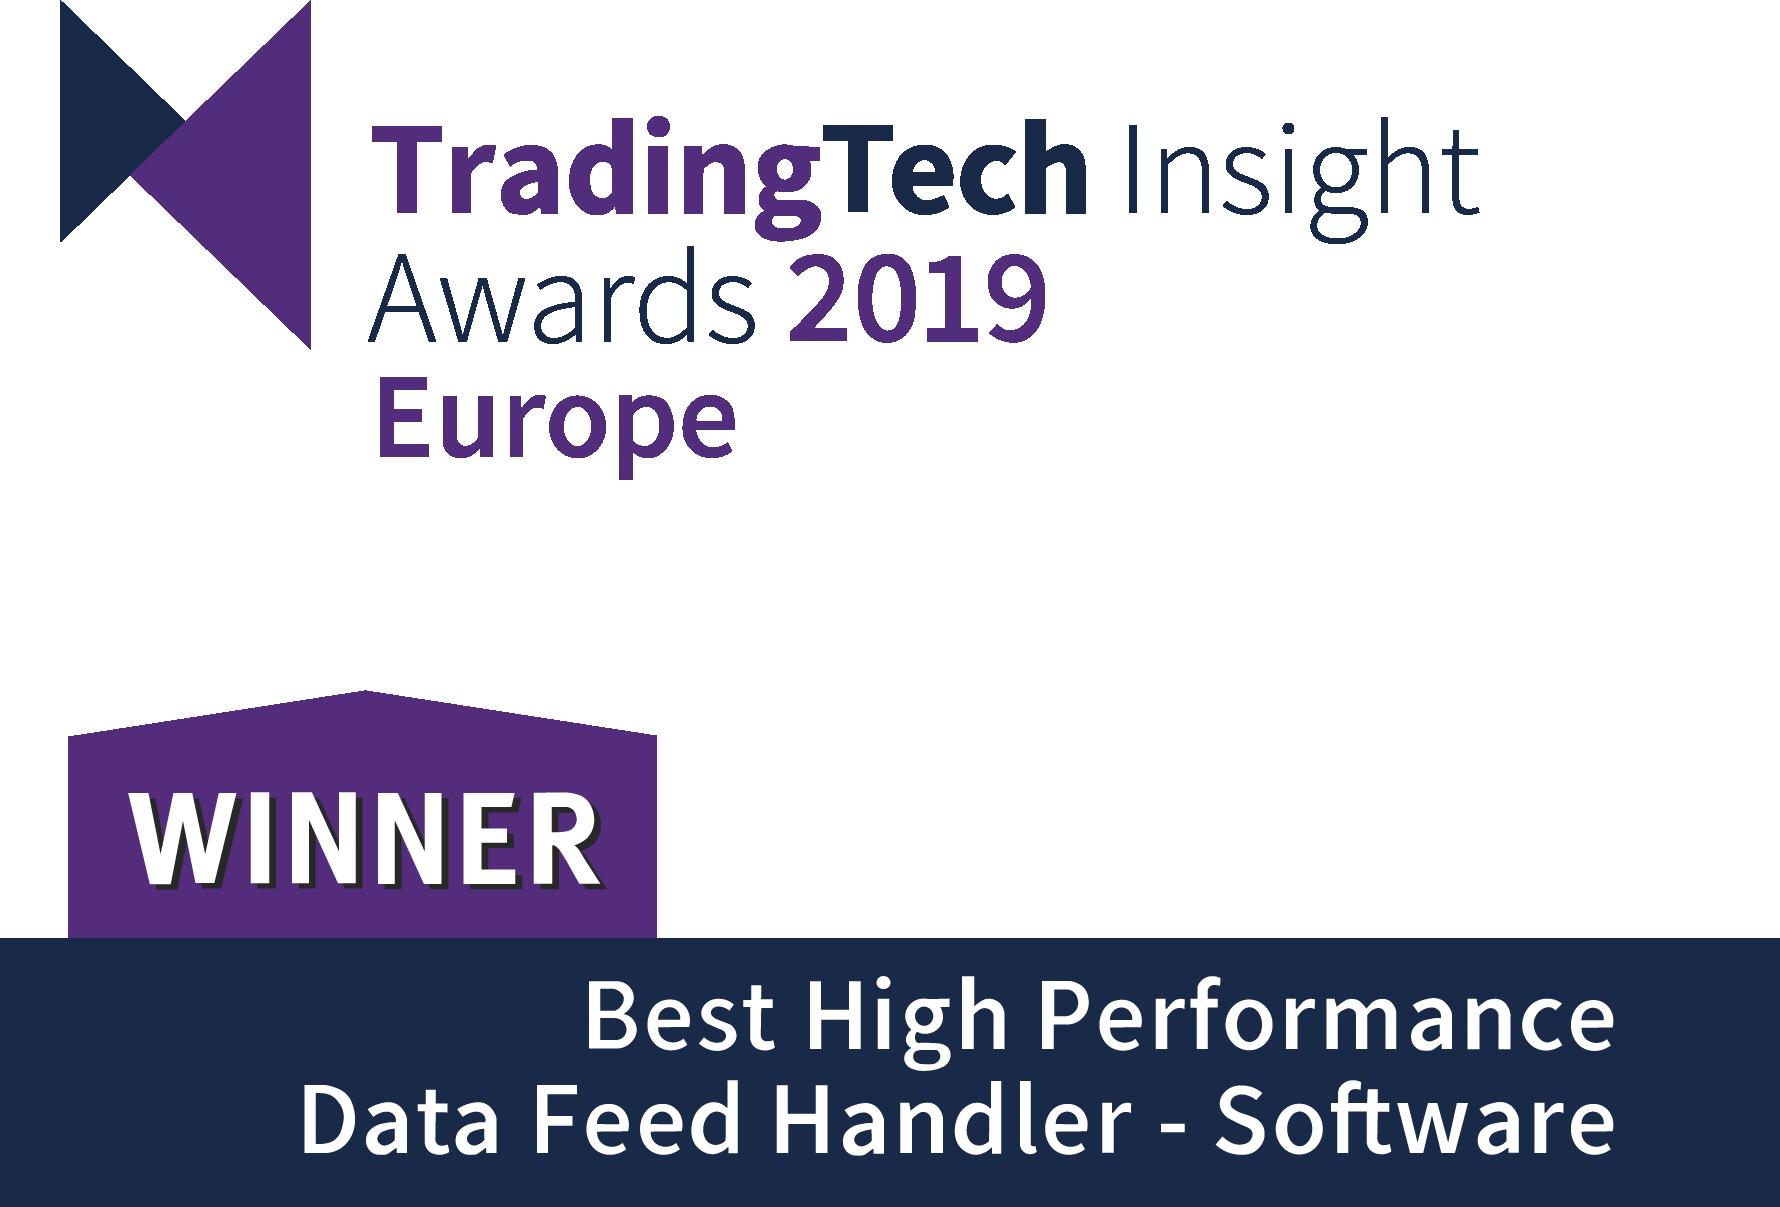 Trading Tech Insight Awards 2019 Europe - Best High Performance Data Feed Handler Winner.png